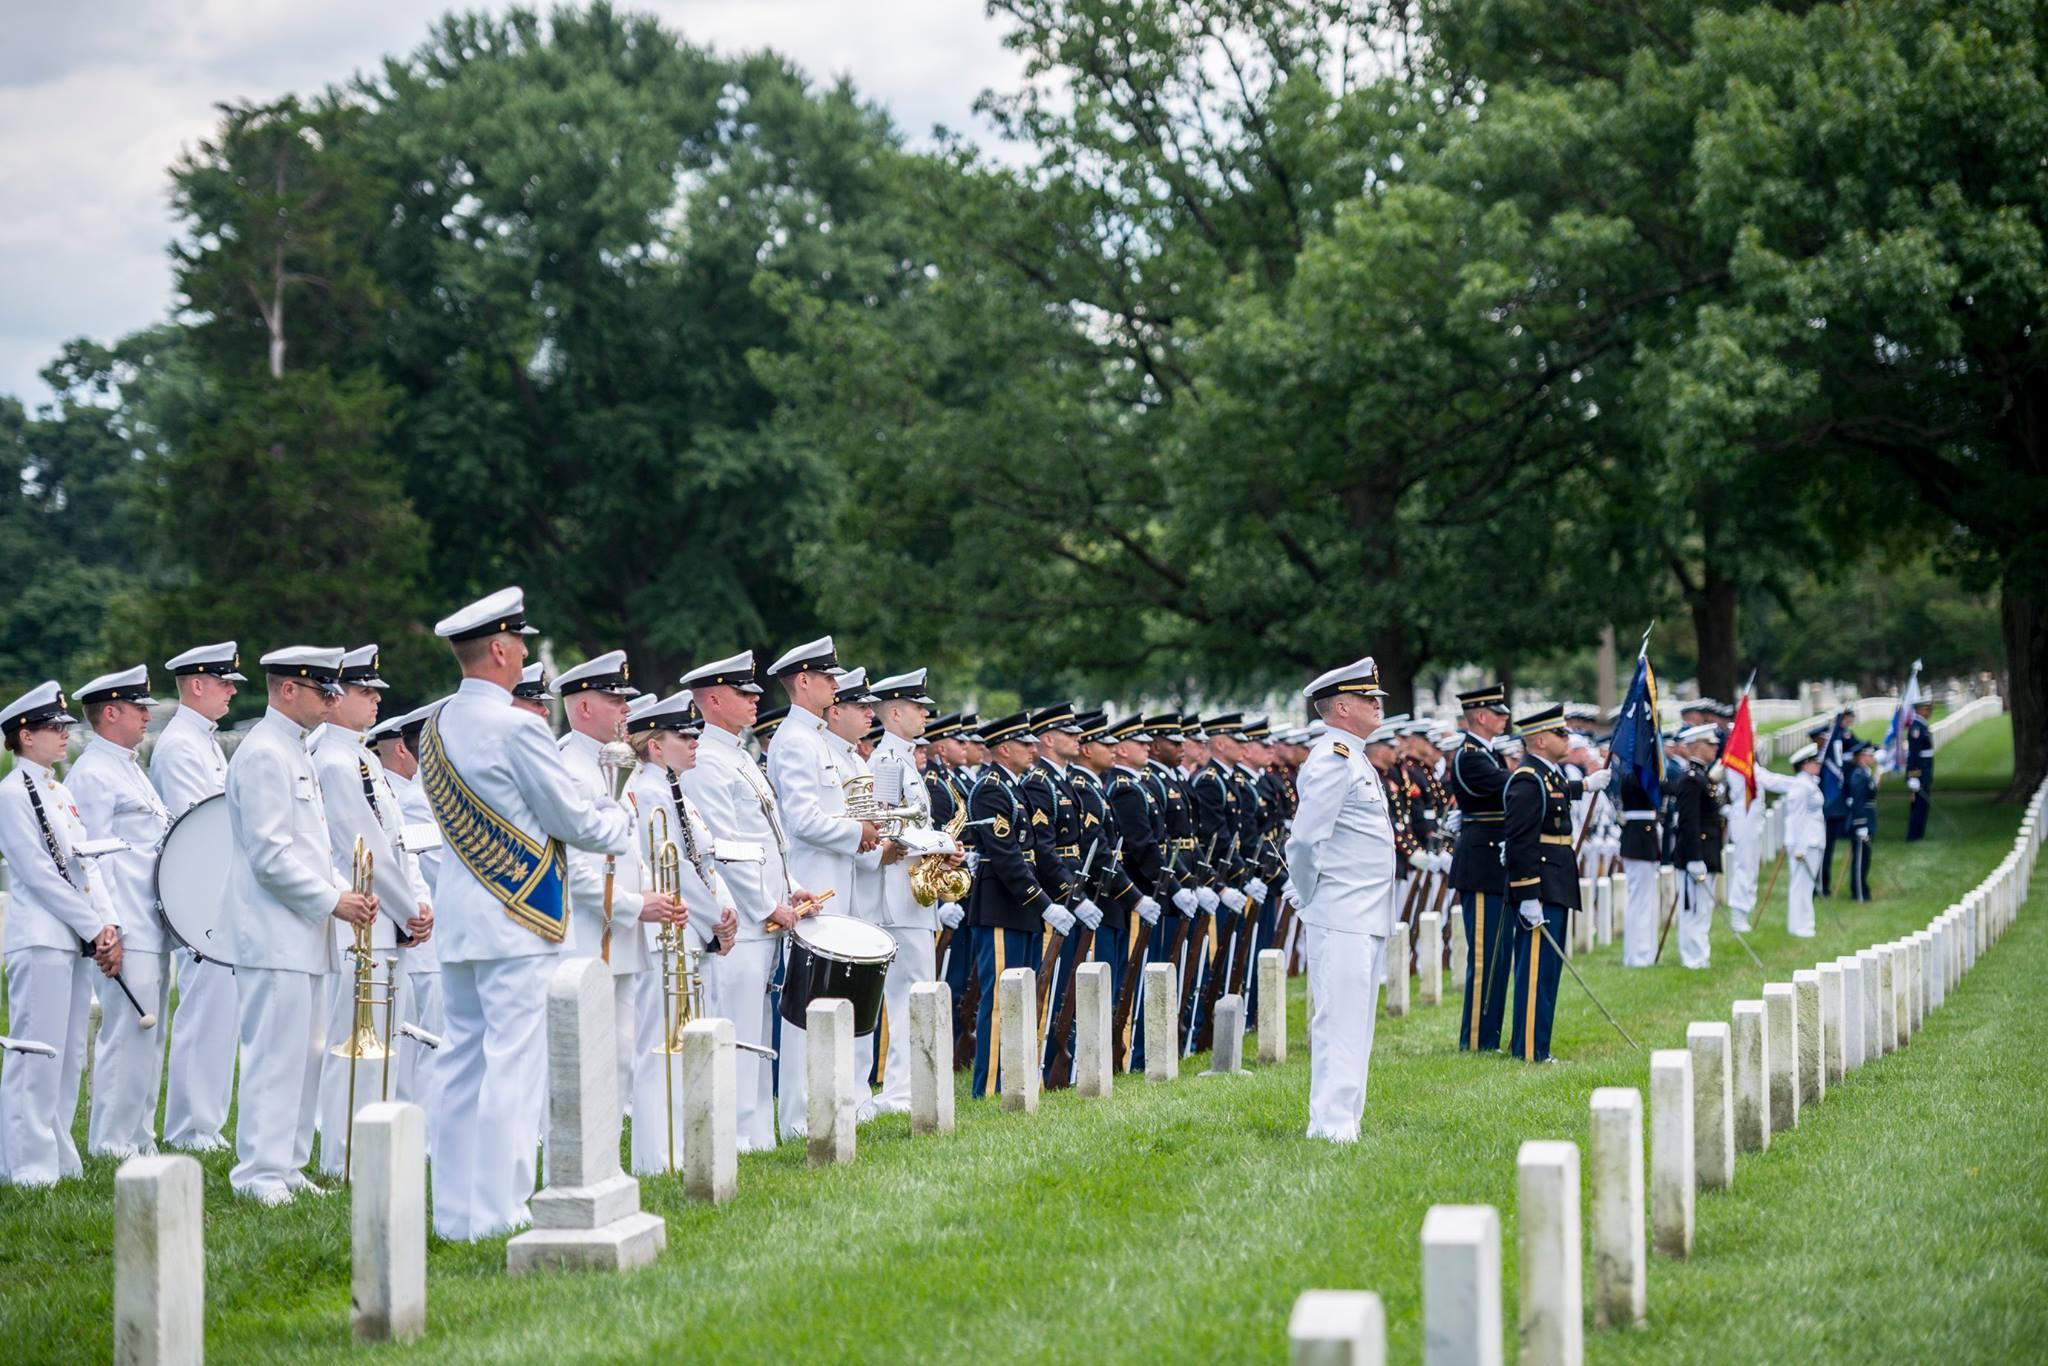 Photo Credit: Arlington National Cemetery